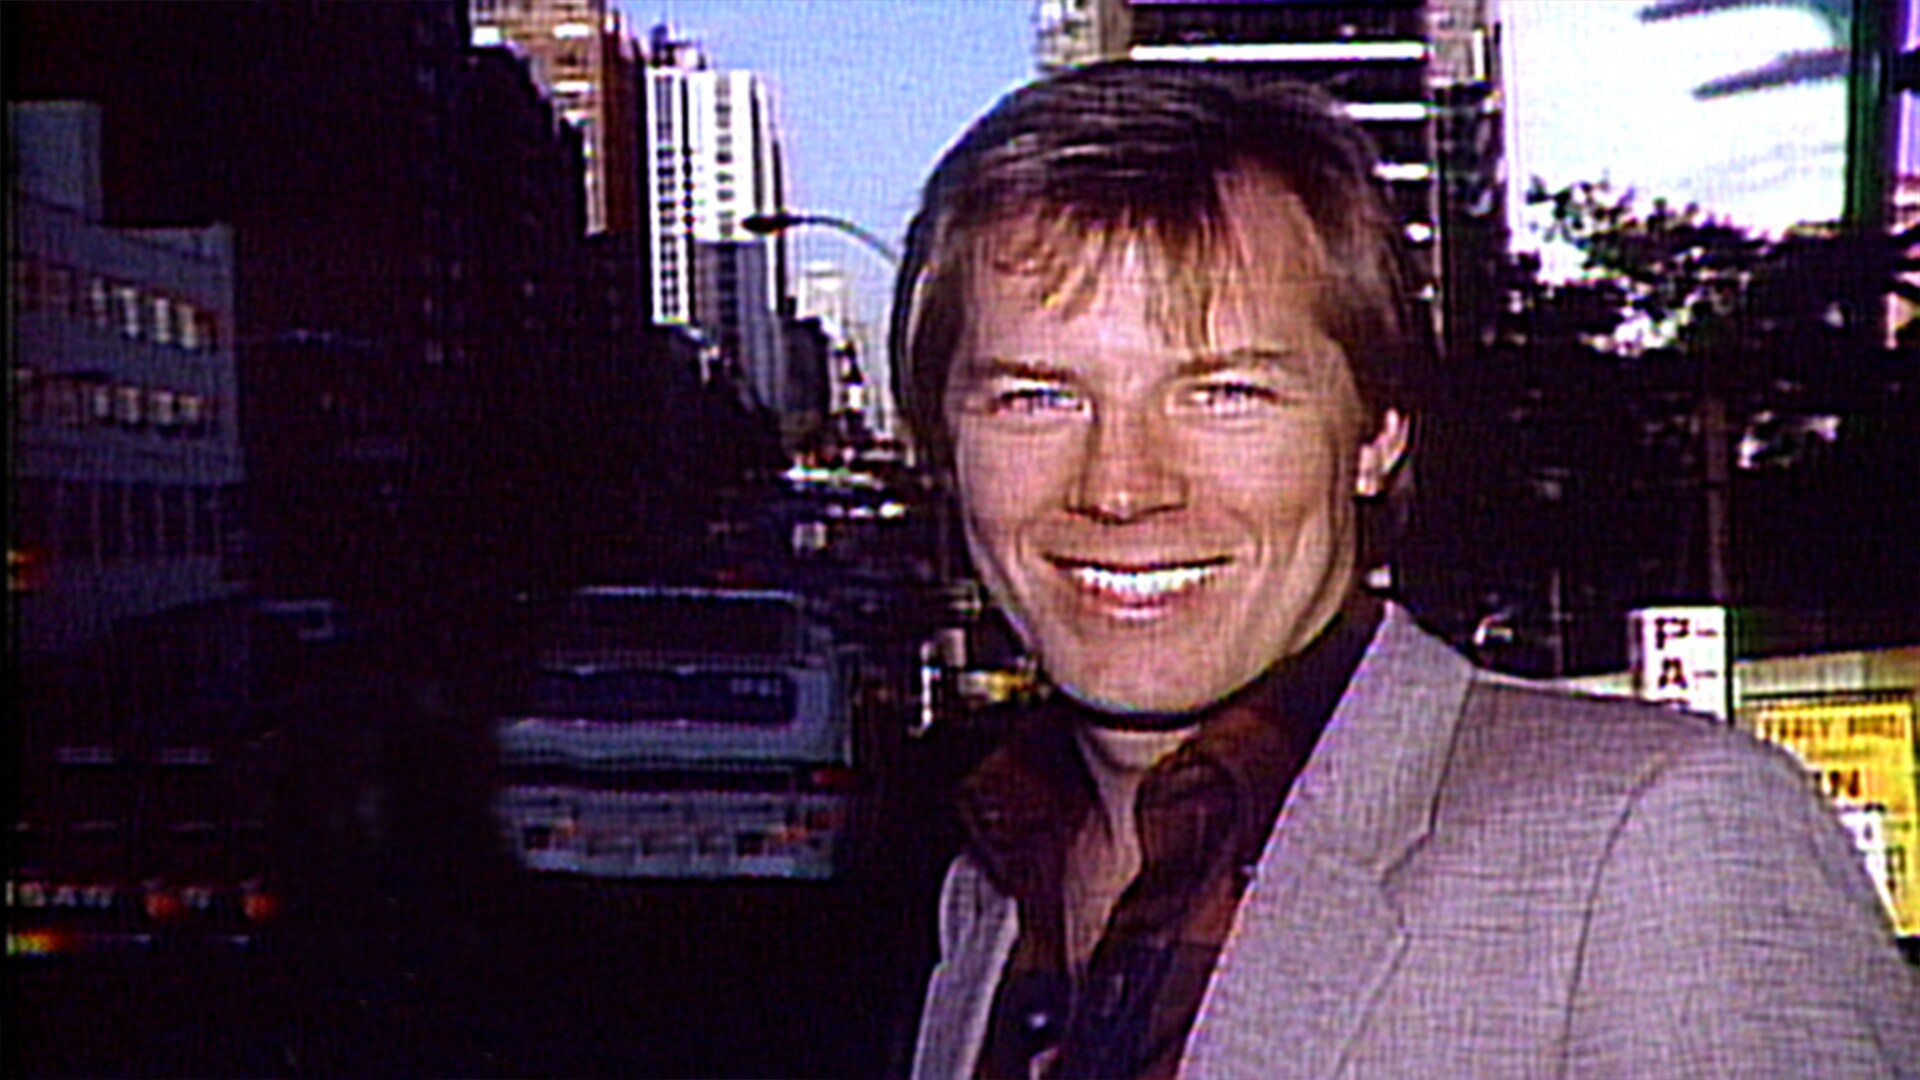 Michael McKean: November 3, 1984